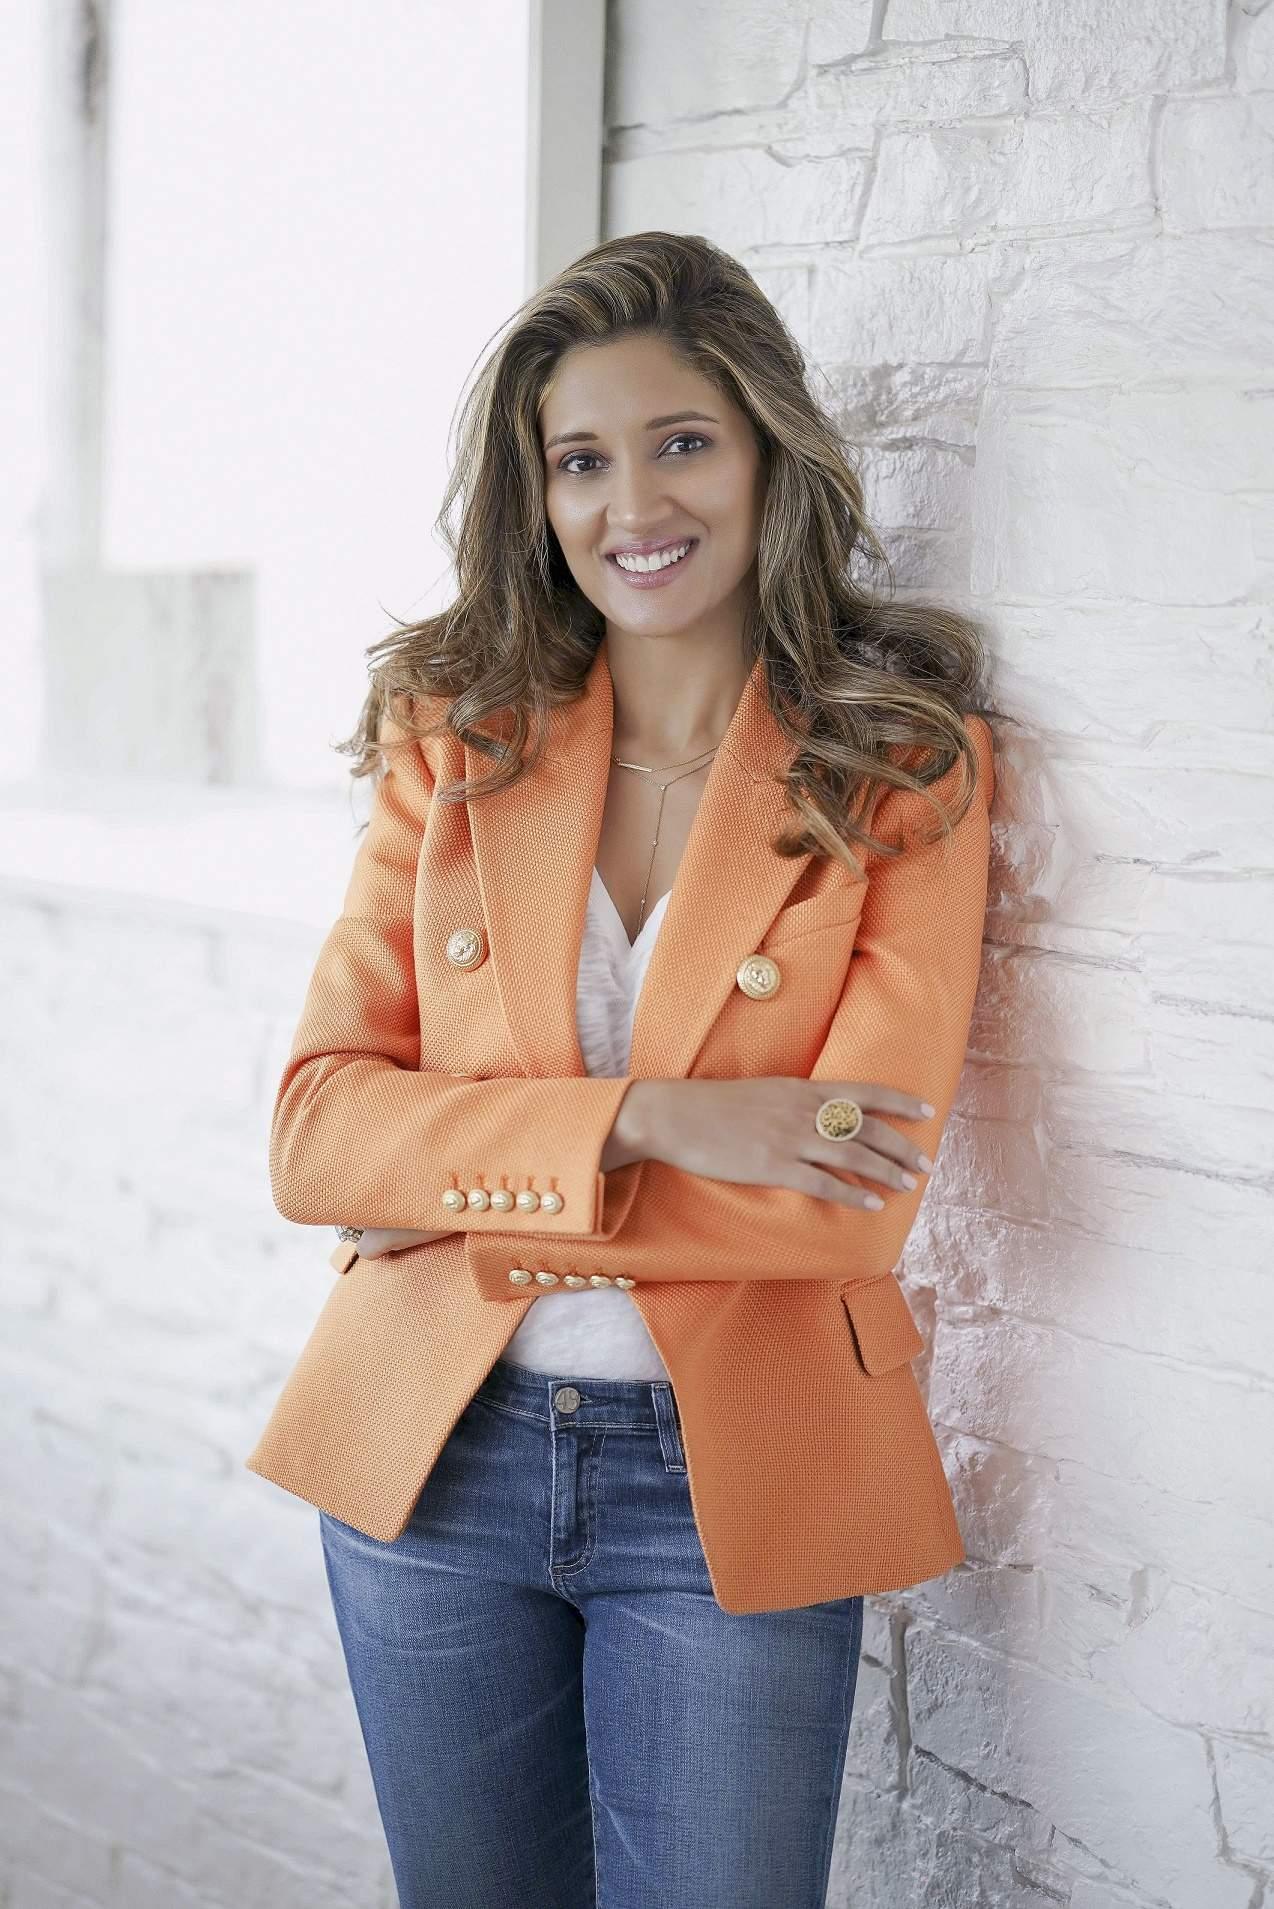 Mallika Tarakas Parekh, Mallika Parekh, a health and wellness expert